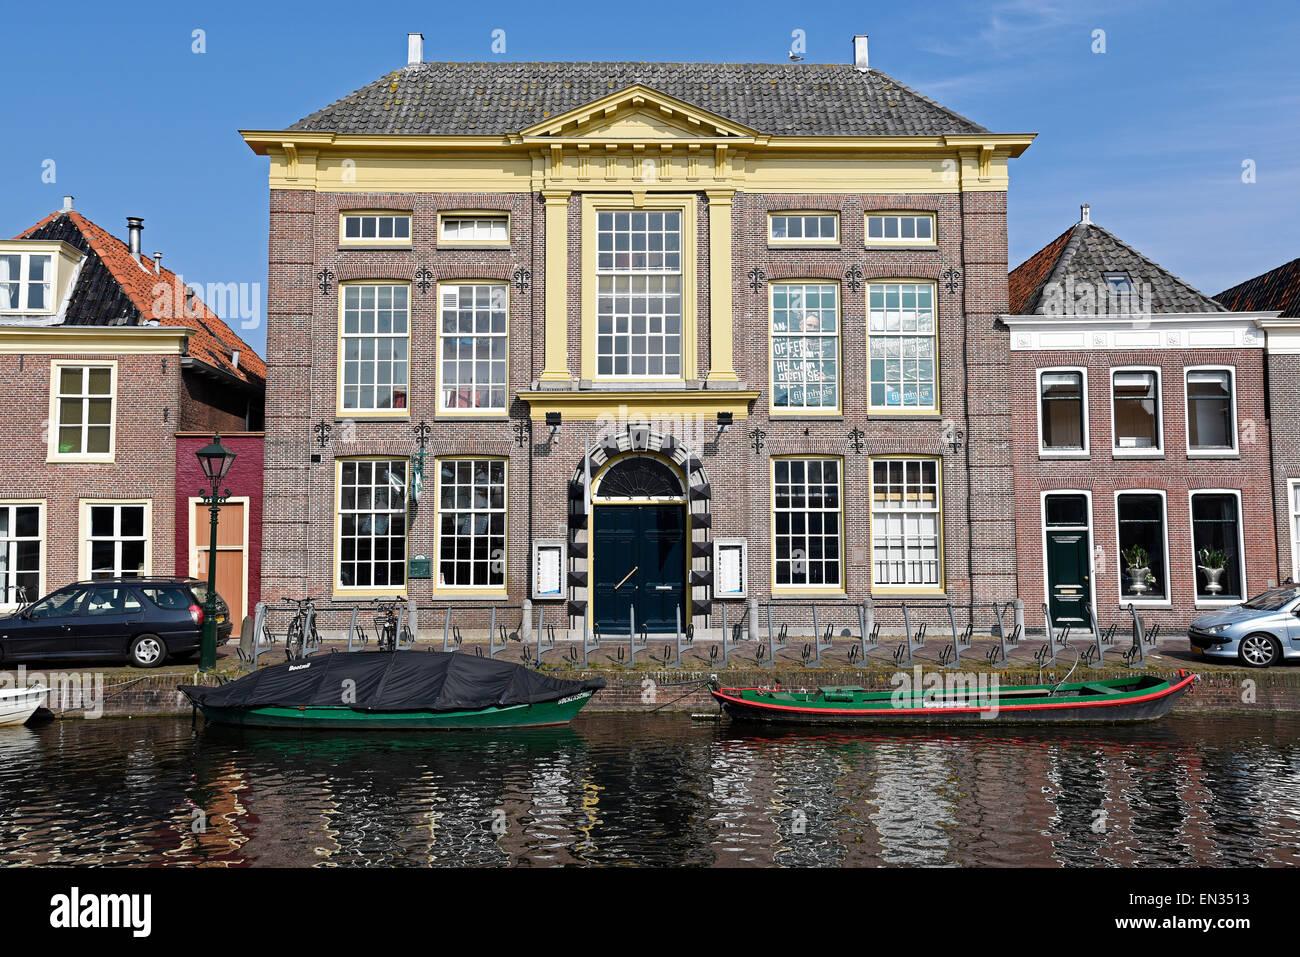 Filmhuis, cinema, Alkmaar, North Holland, The Netherlands - Stock Image